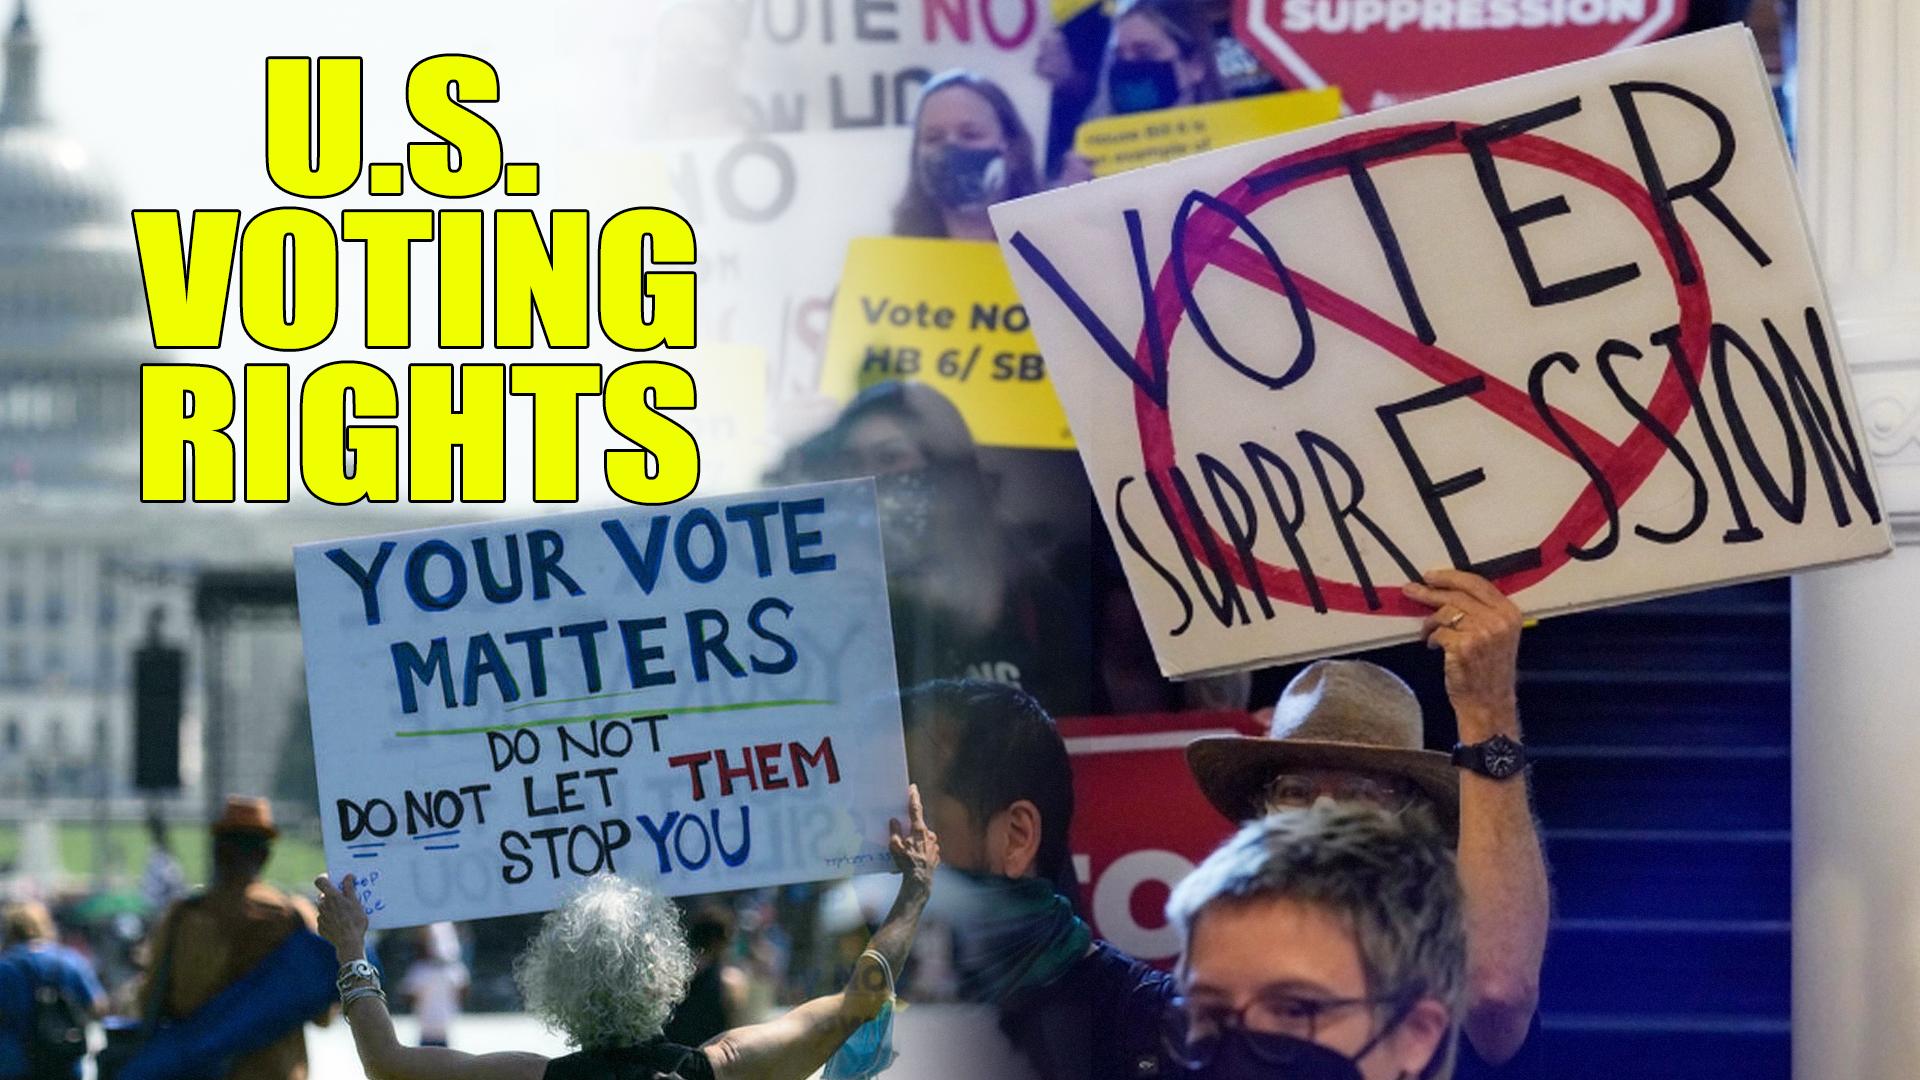 US voter suppression, racism